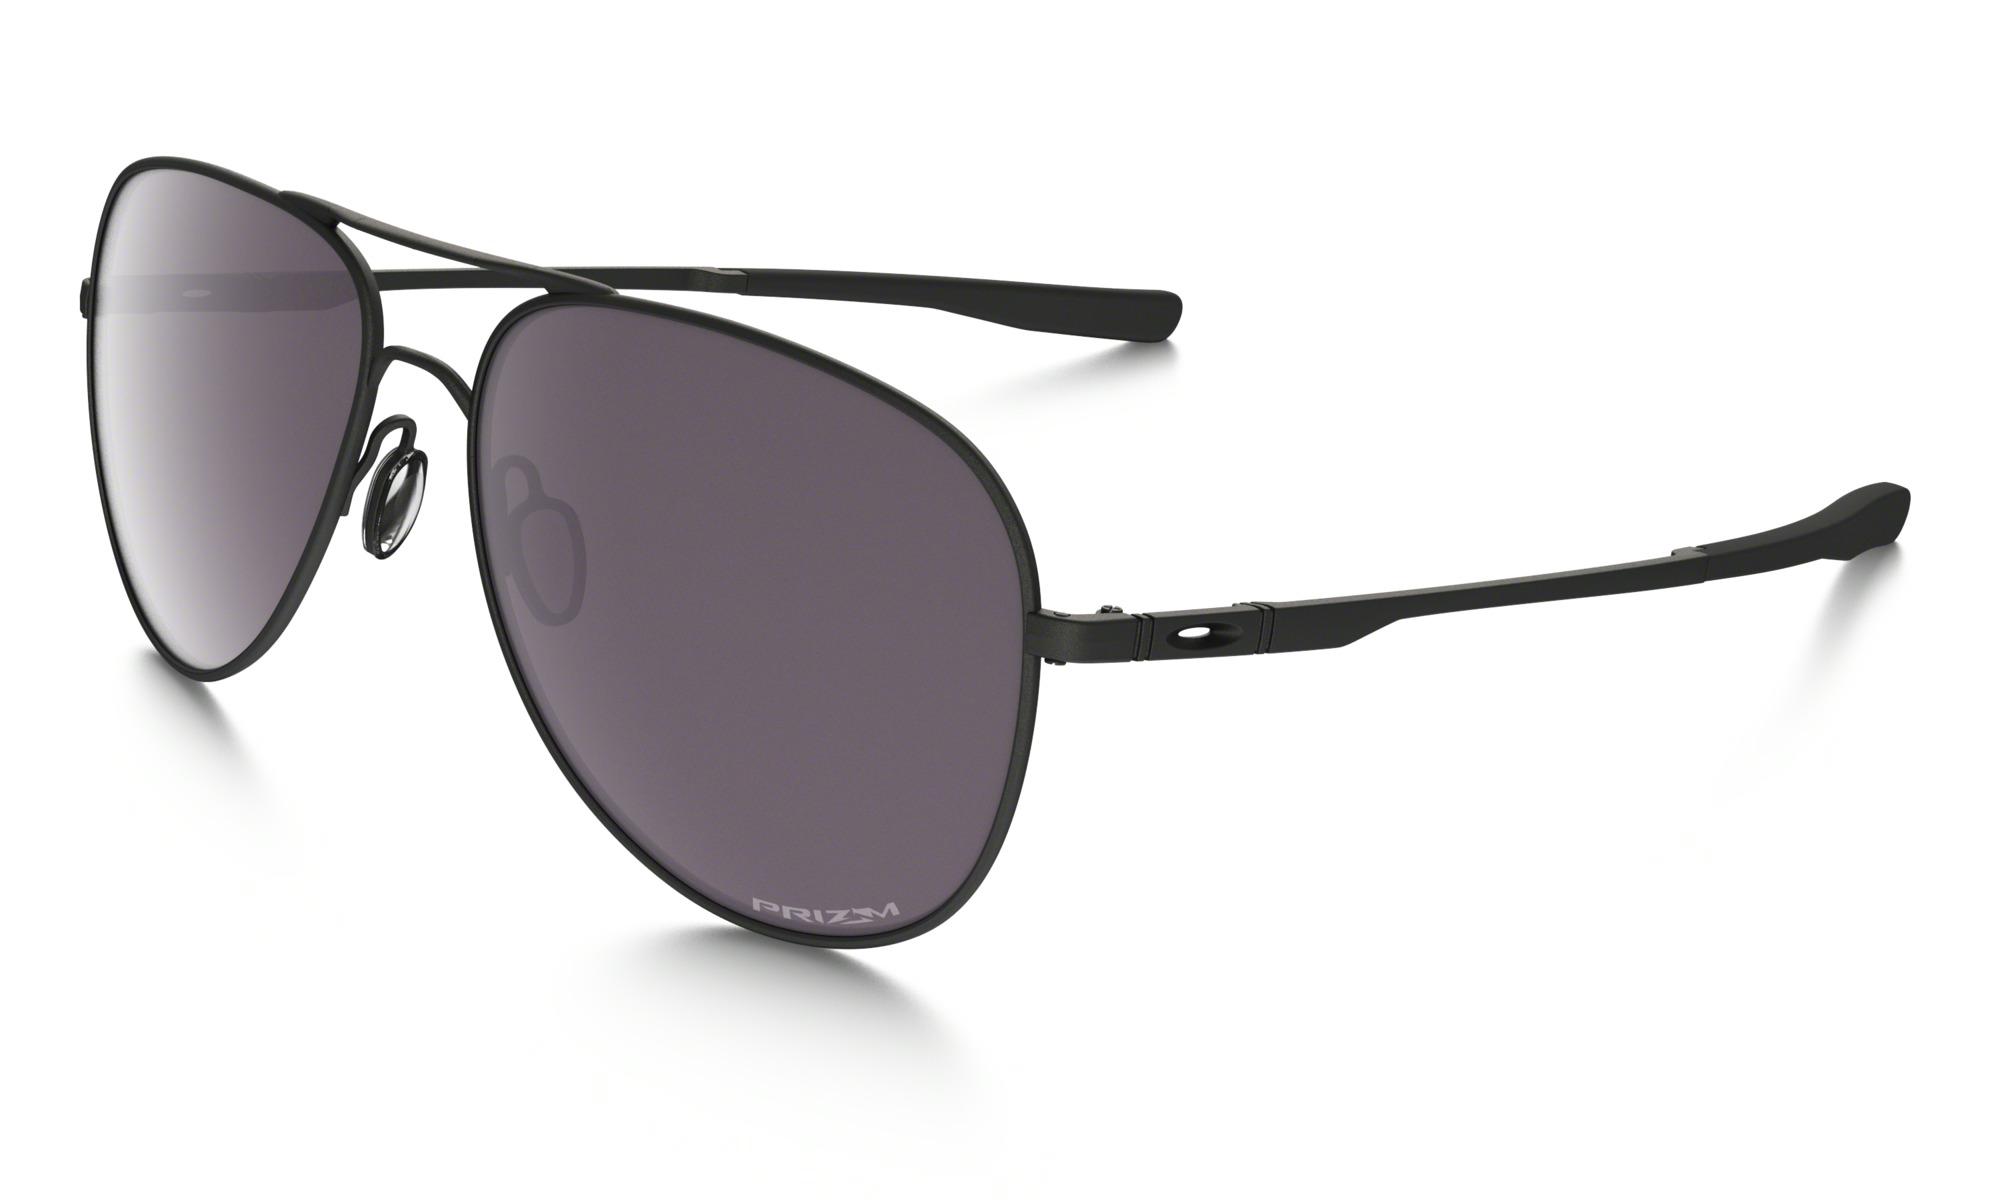 Oakley Elmont Sunglasses, Oakley Elmont Prescription Sunglasses